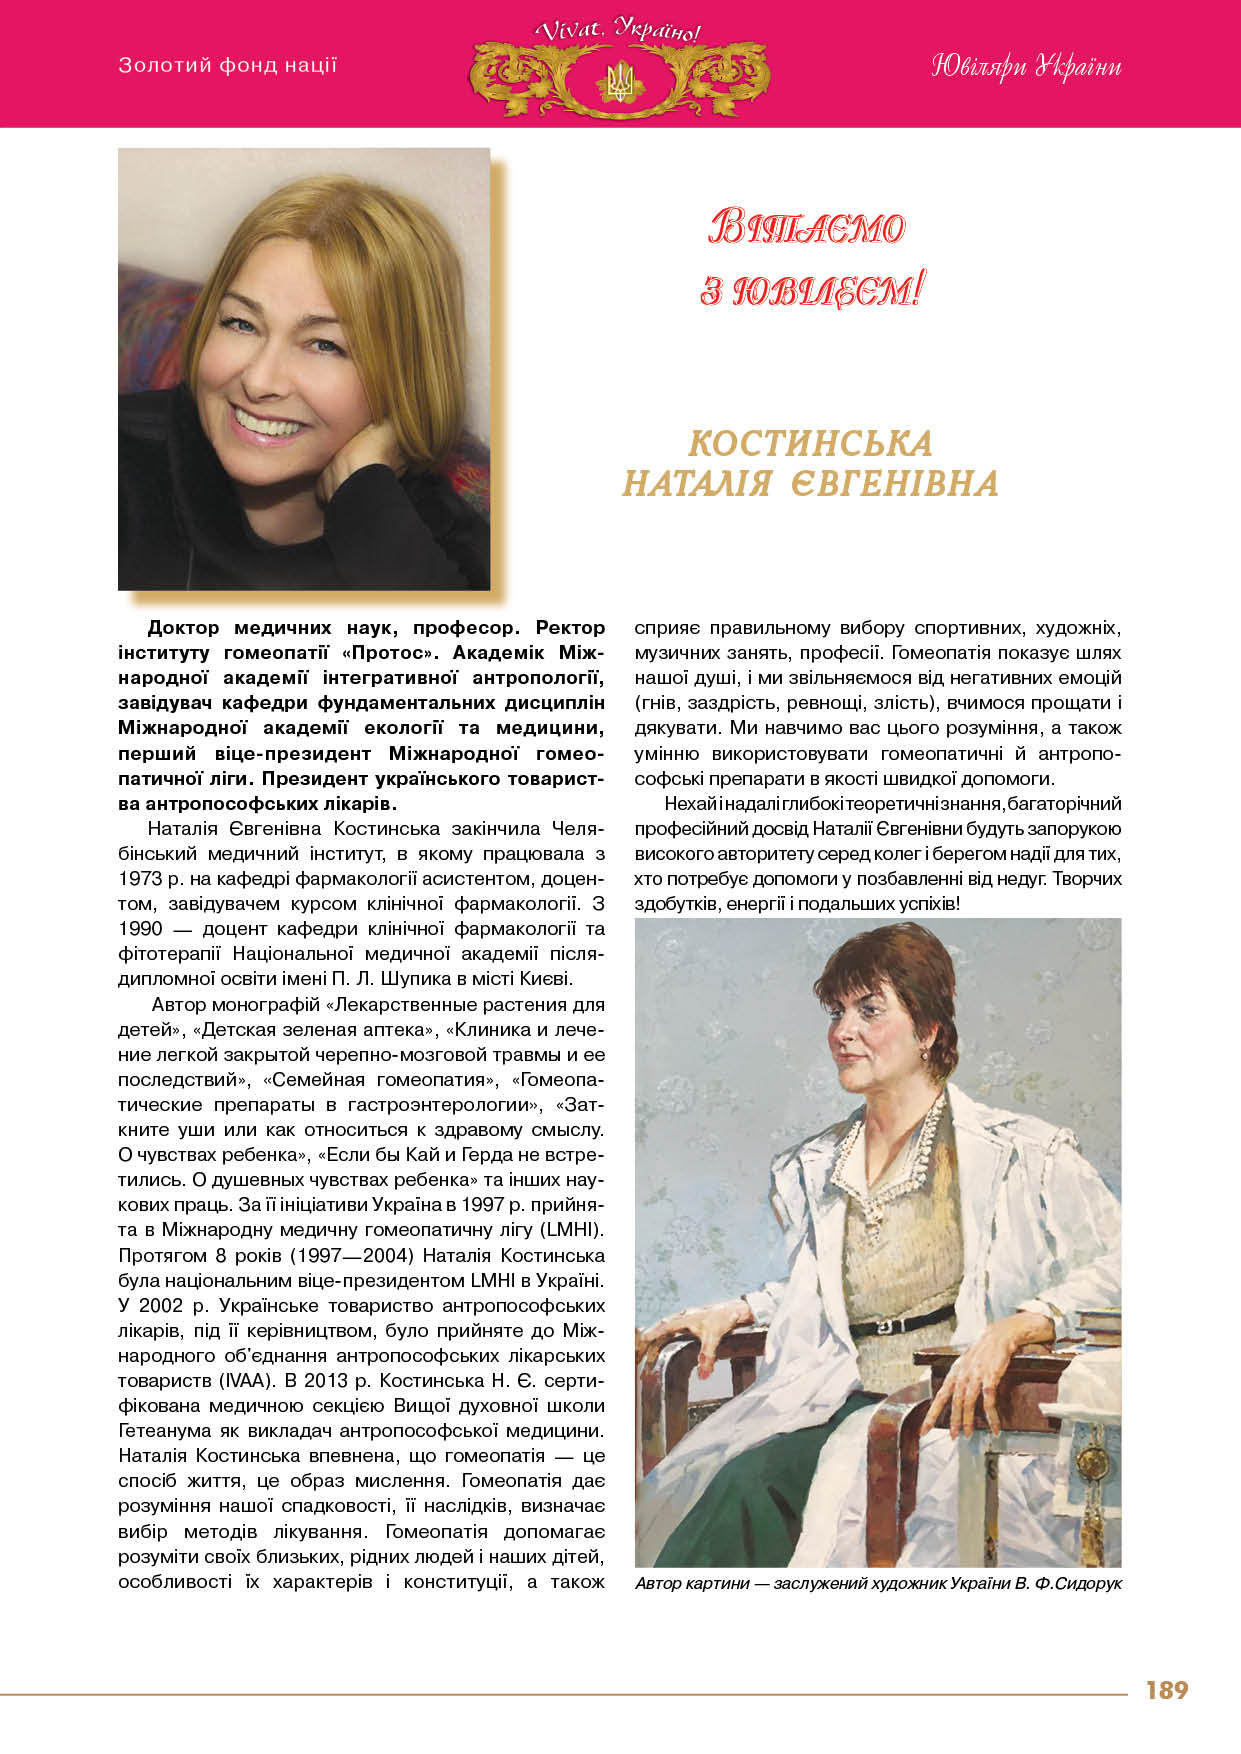 Костинська Наталія Євгенівна